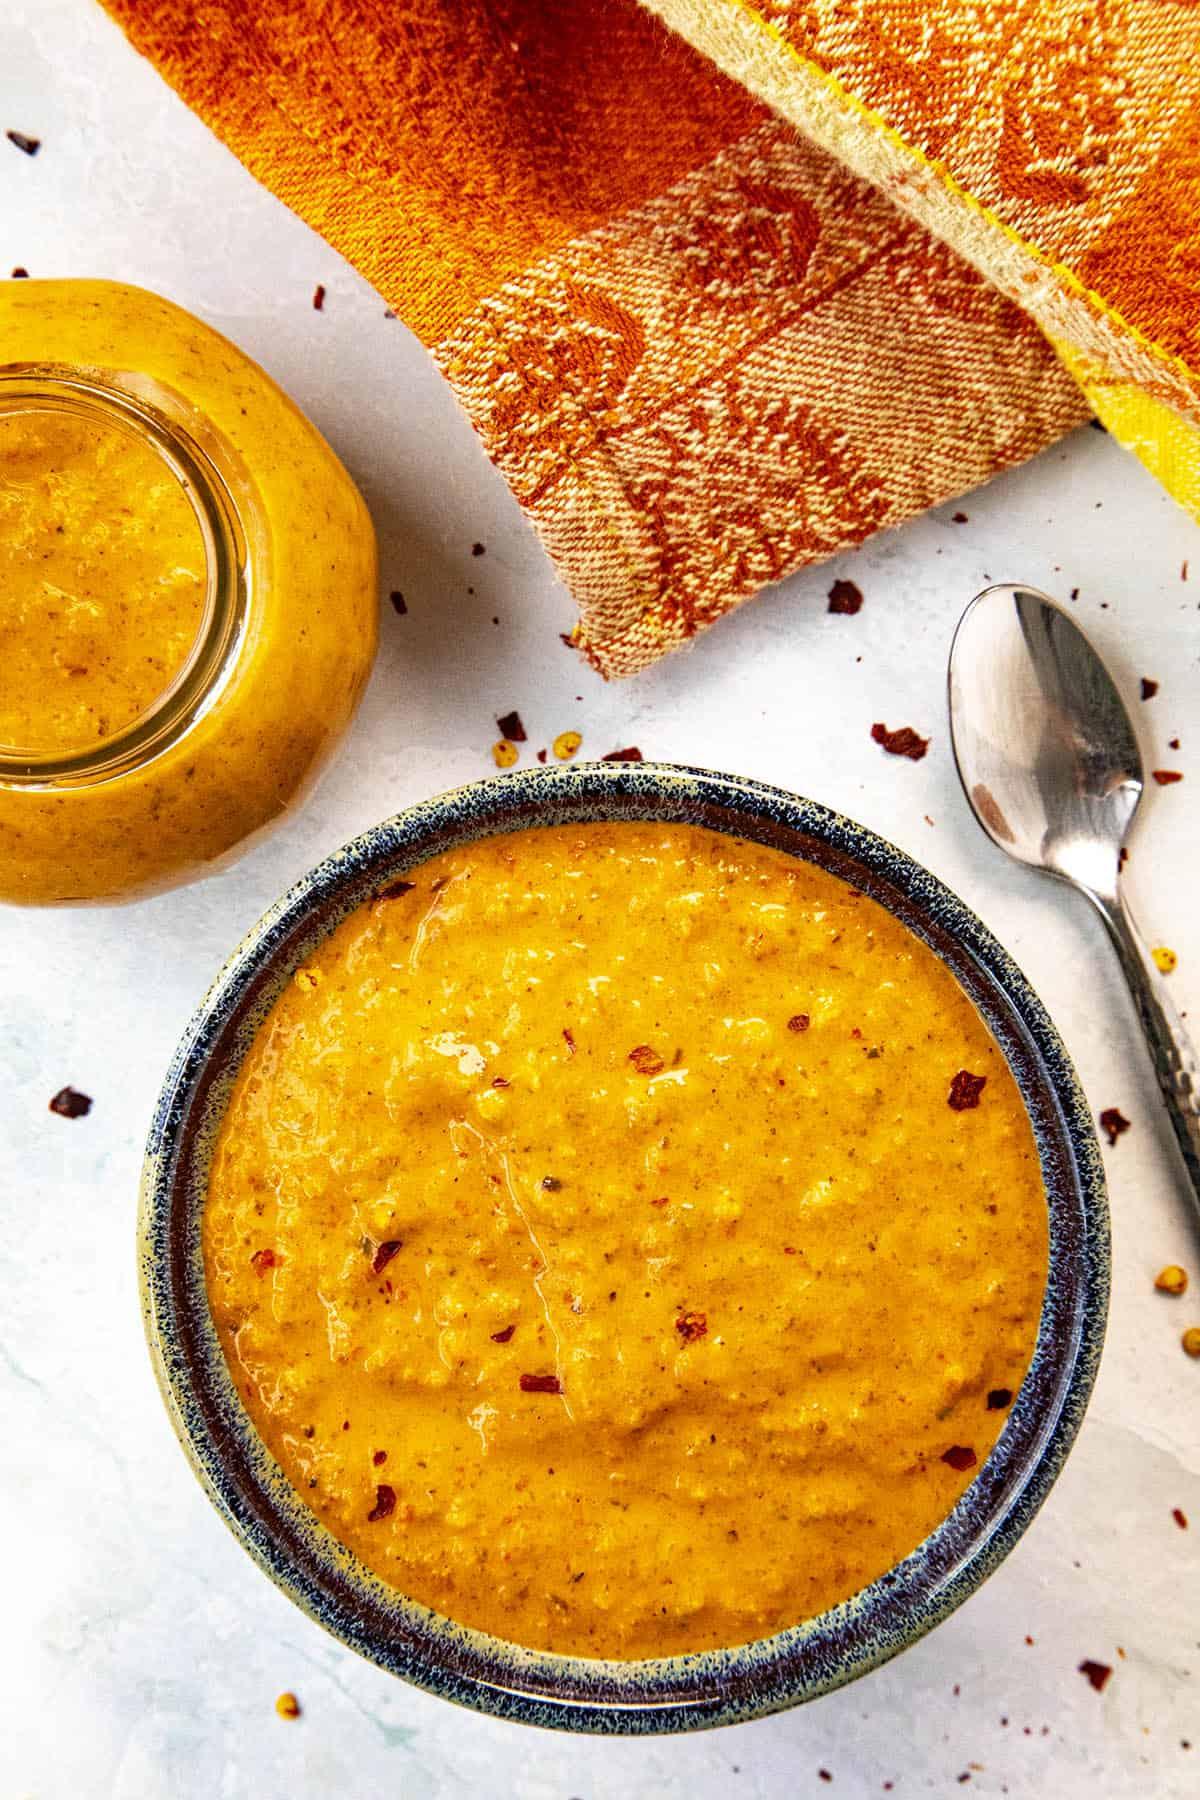 Harissa Sauce in a bowl